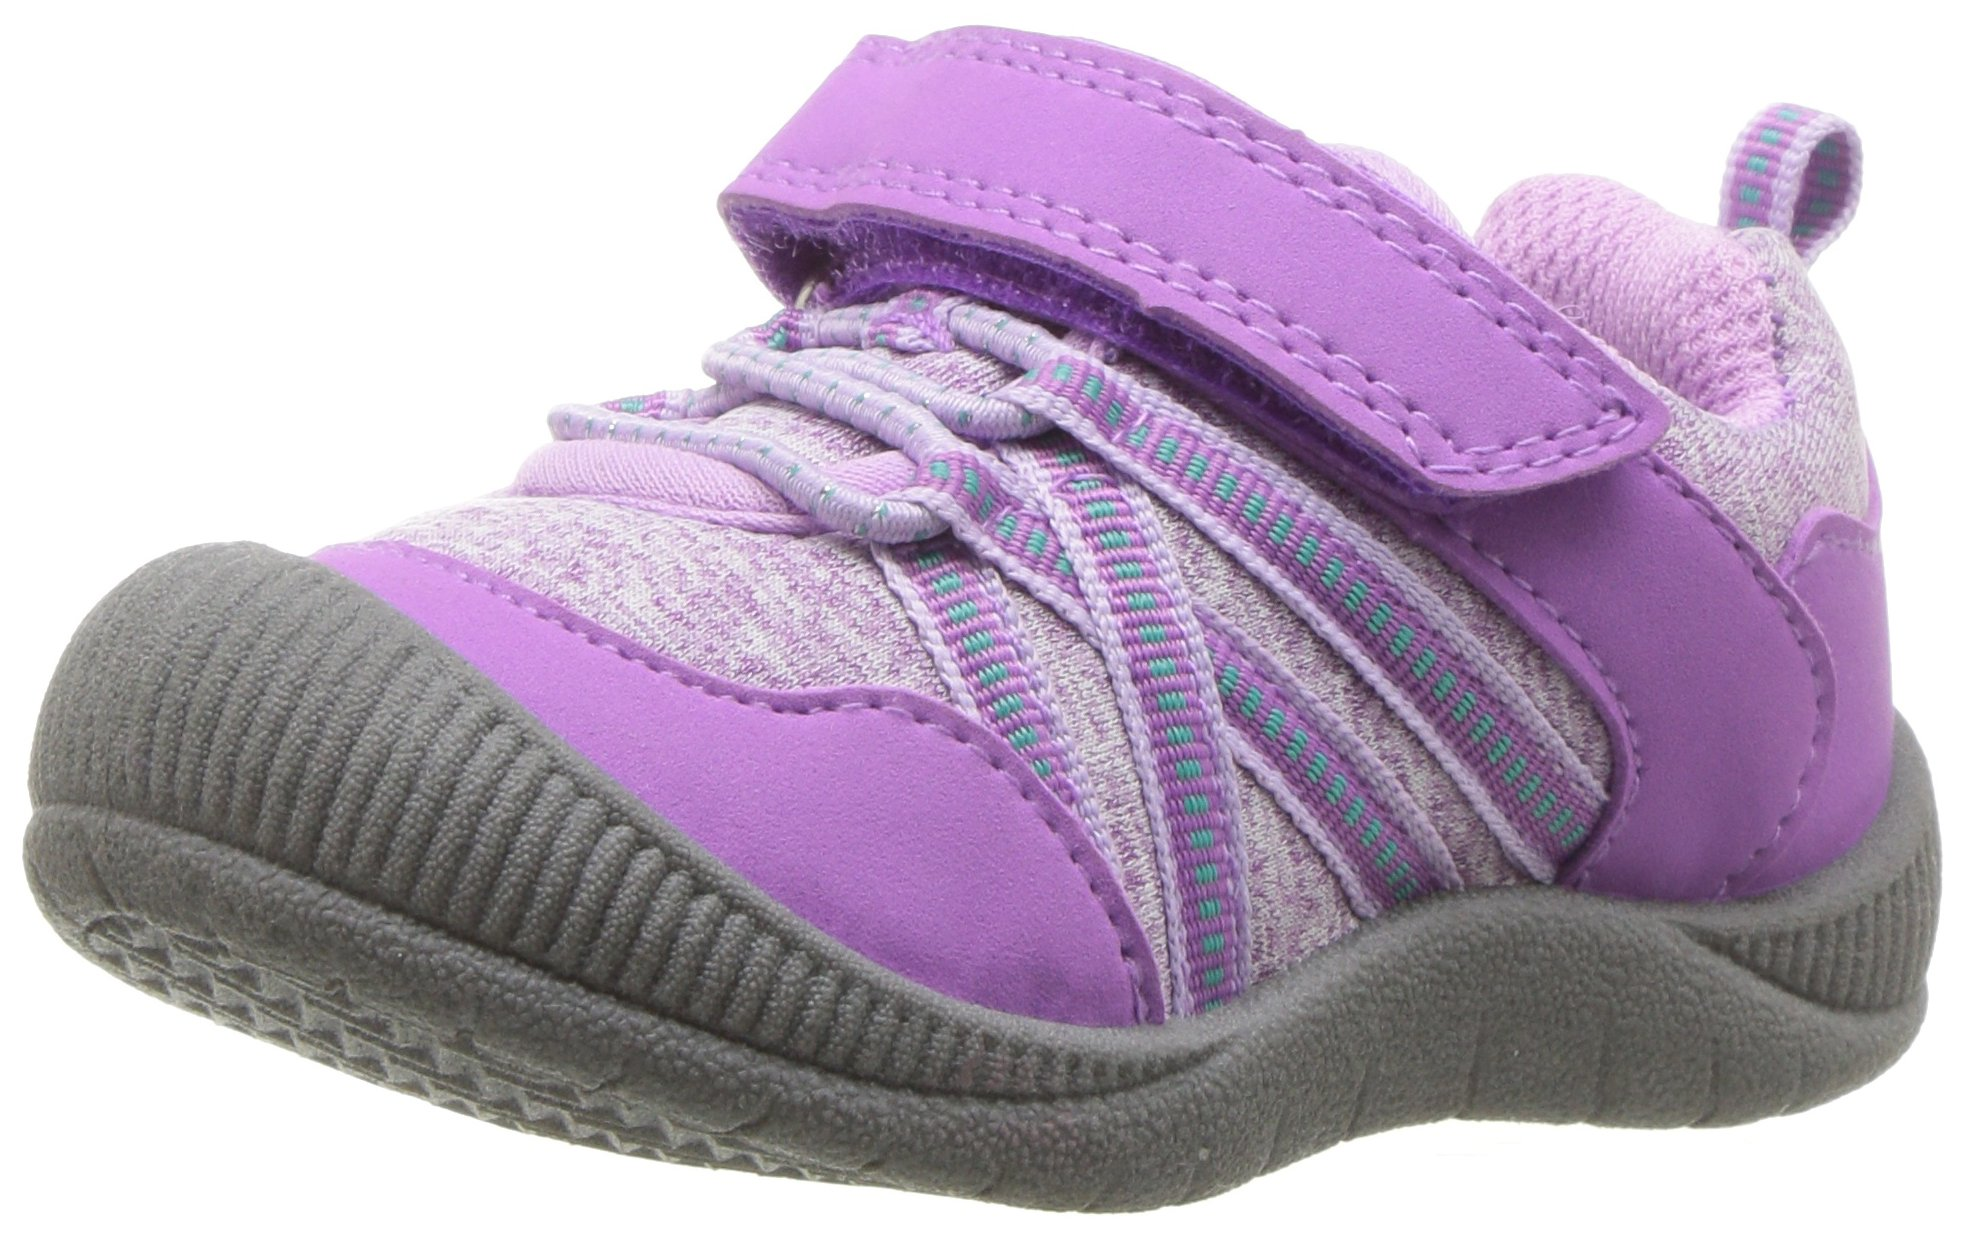 OshKosh B'Gosh Girls' Nova Sneaker, Purple, 7 M US